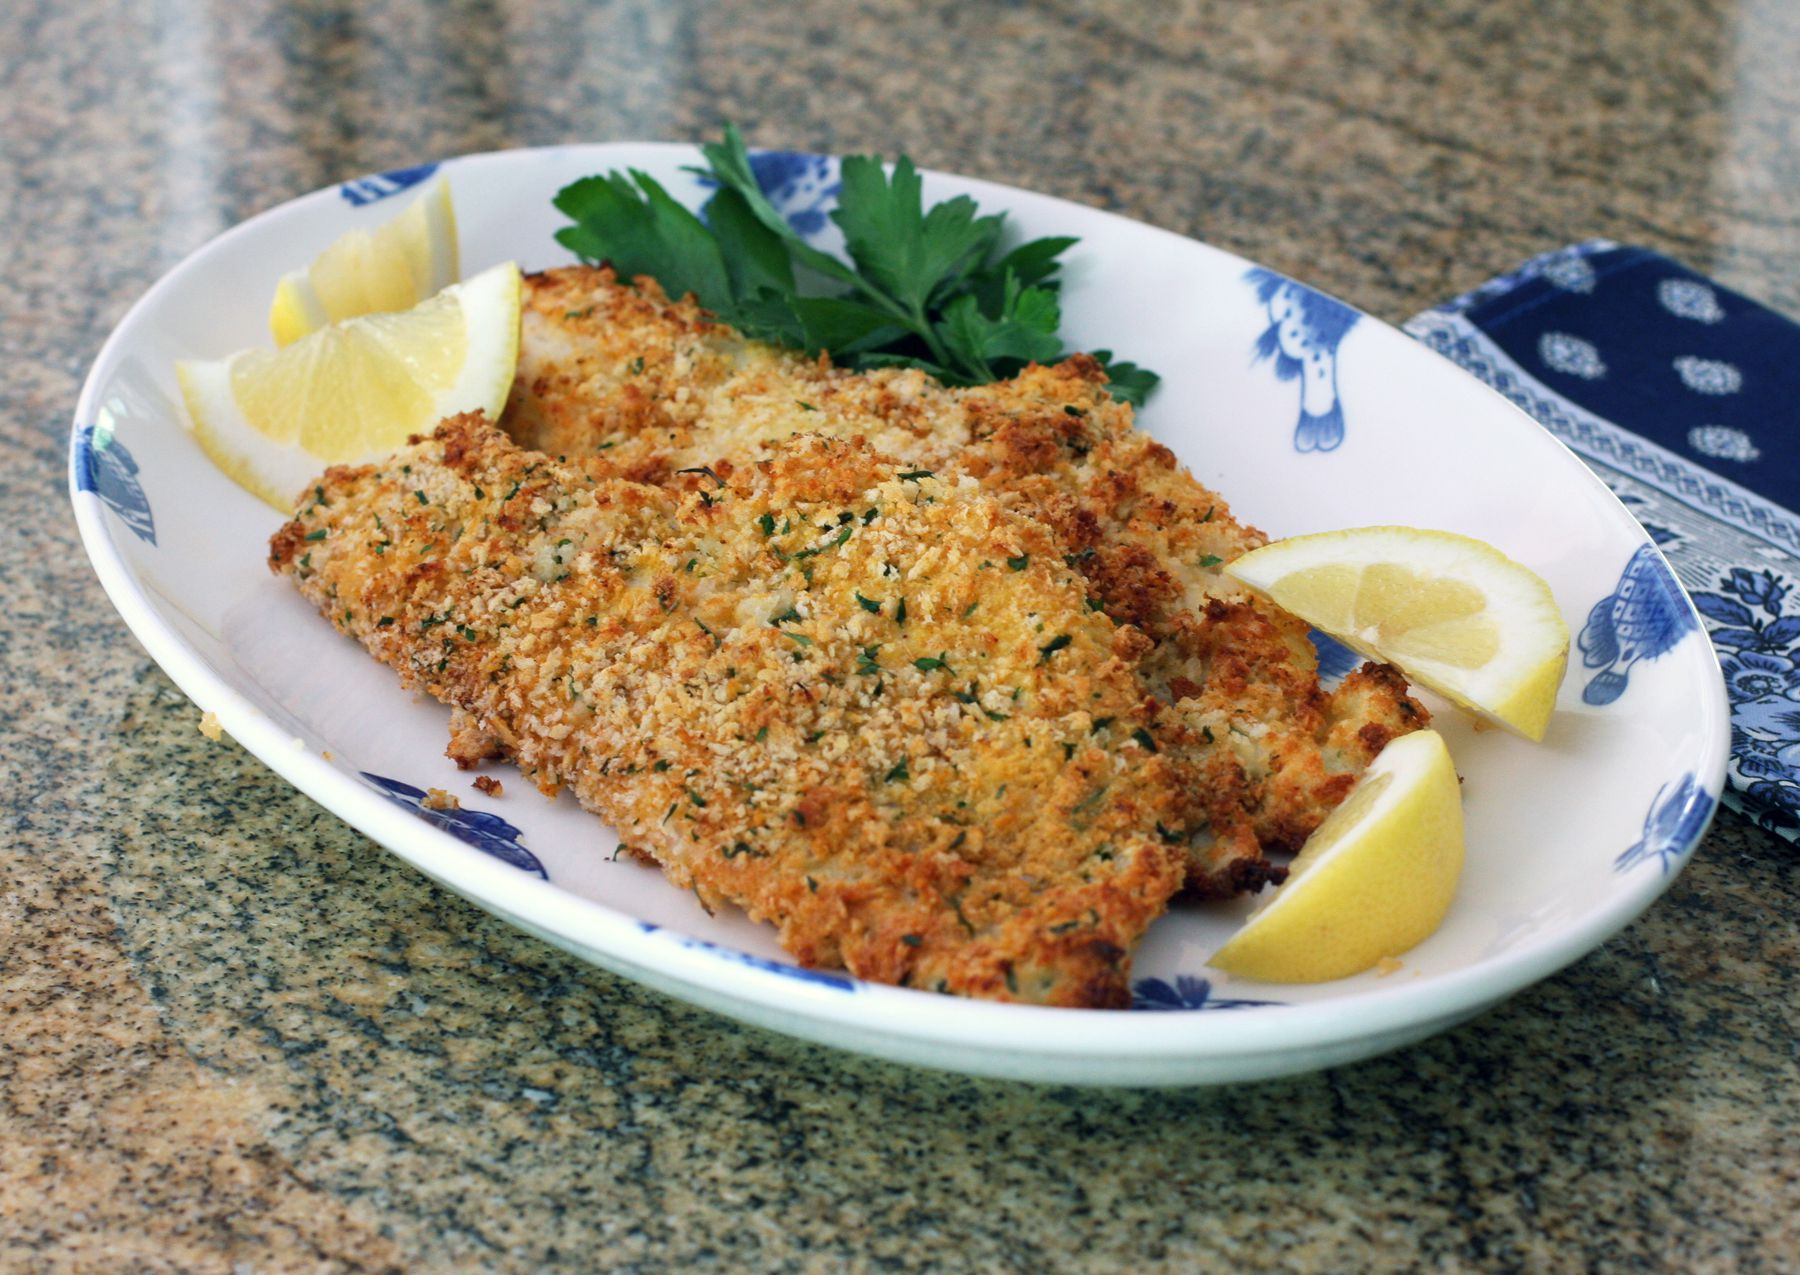 Baked Panko Crusted Fish Recipe